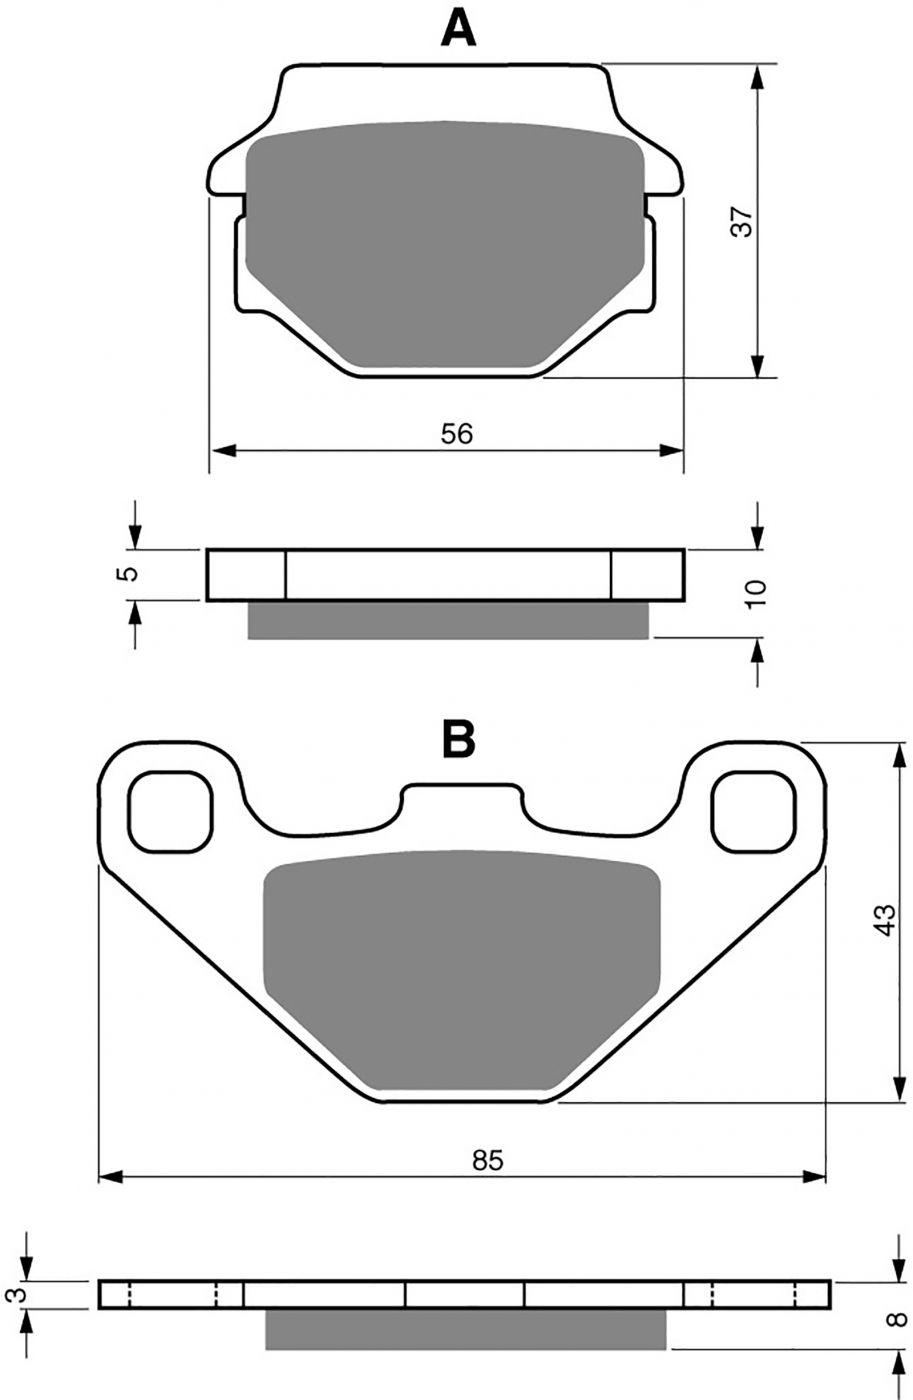 goldfren s33 brake pads - 700005GS image